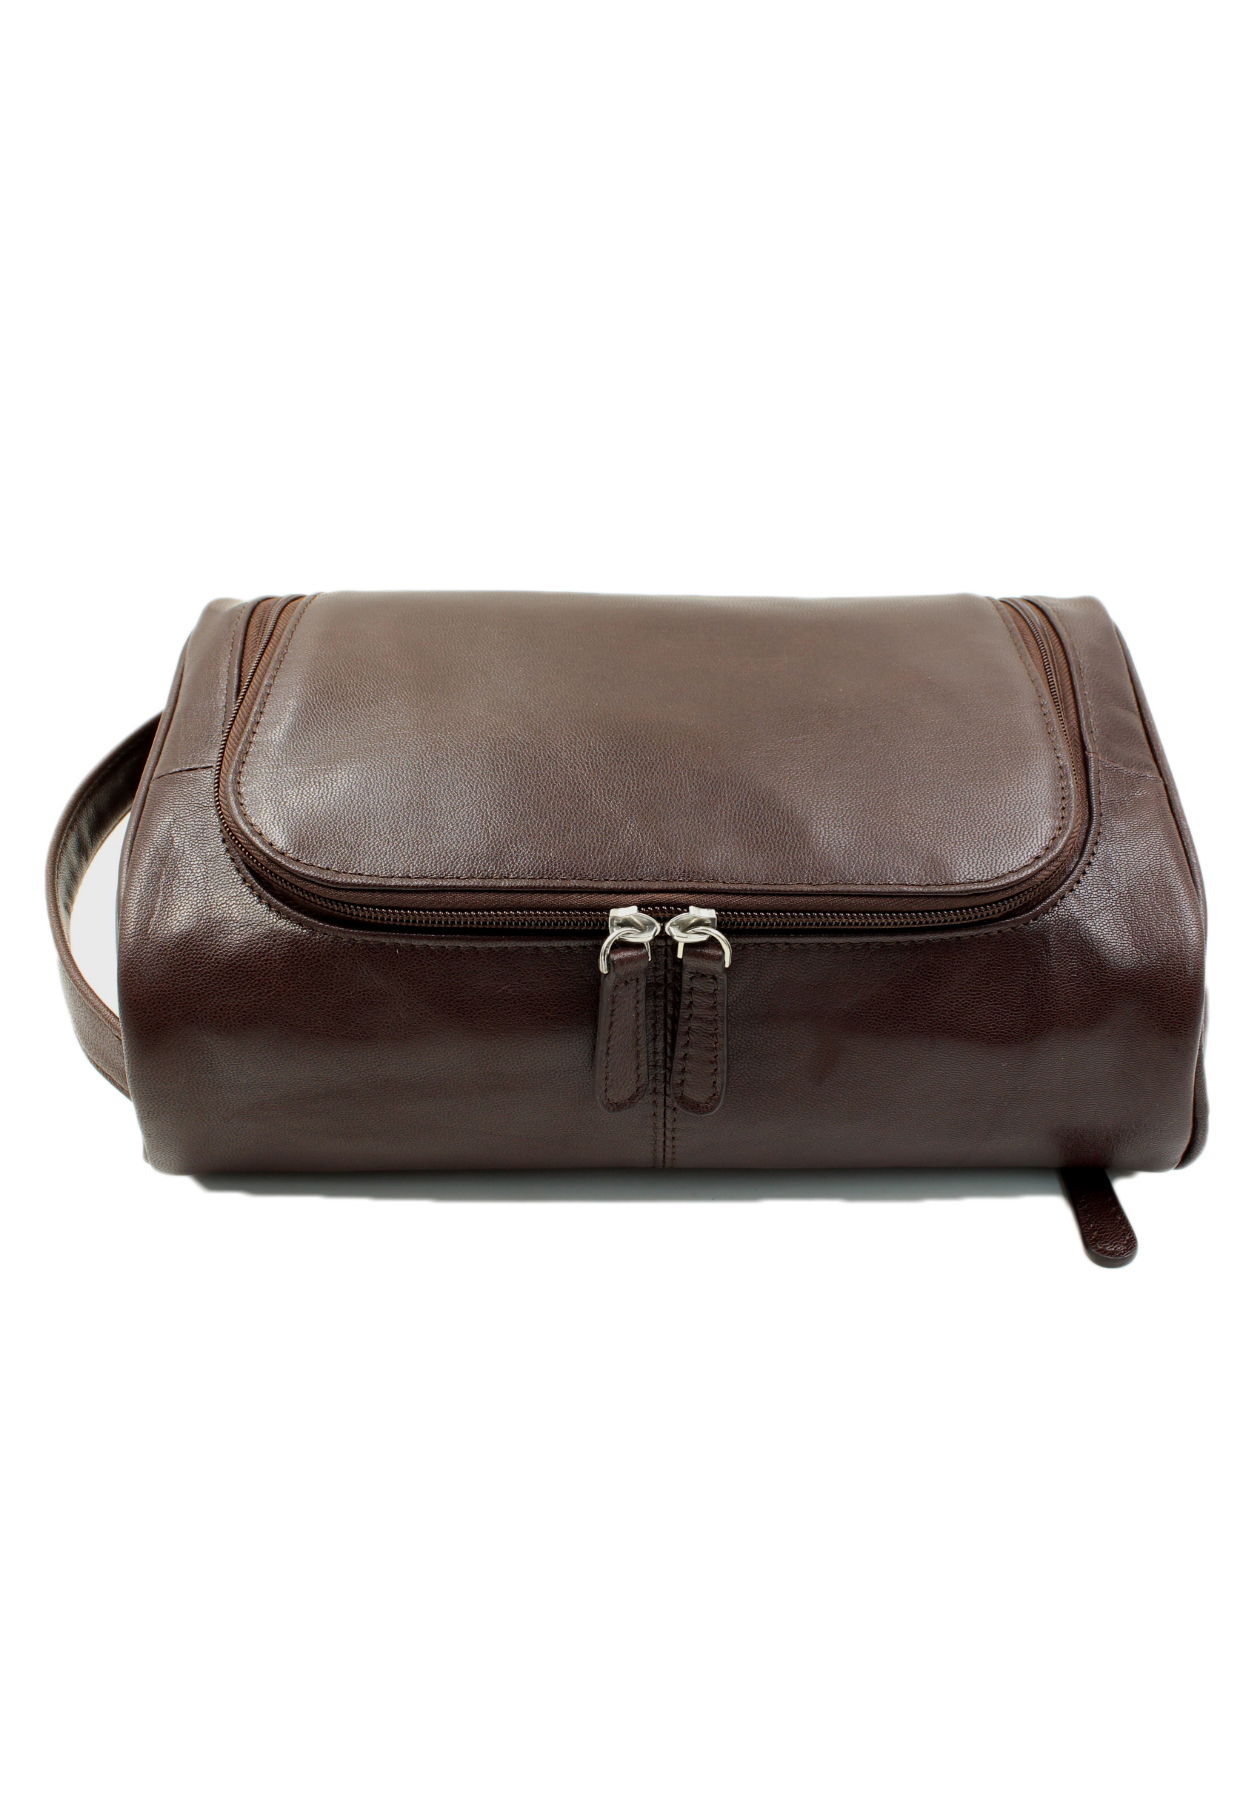 Goat Nappa Leather Hanging Travel Kit